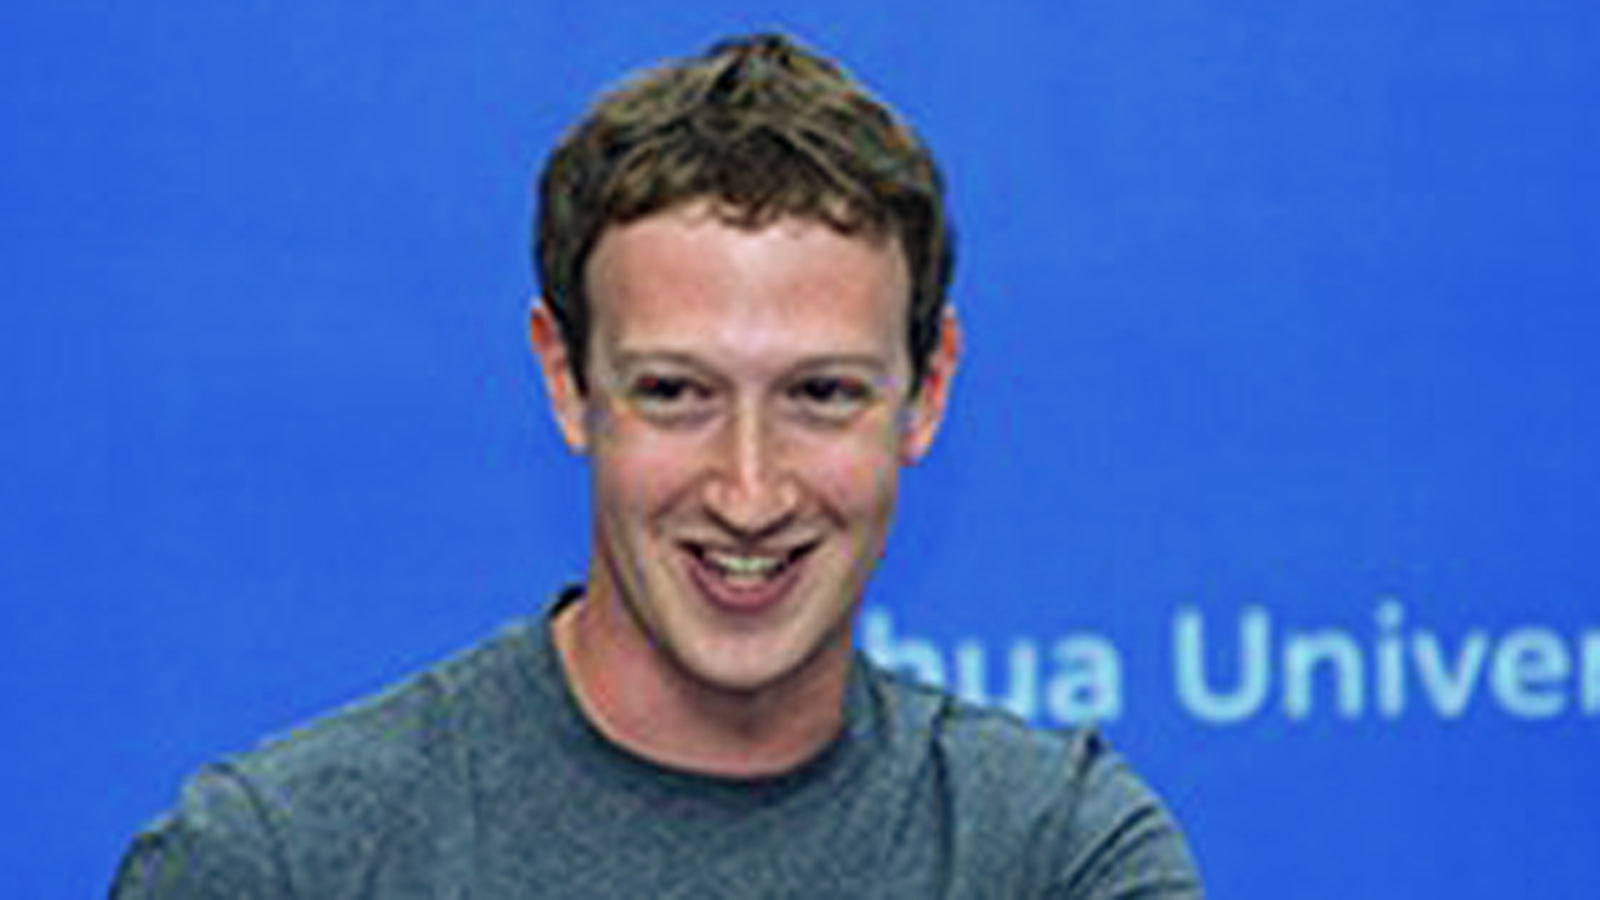 Facebook's Zuckerberg speaks Chinese in Beijing visit